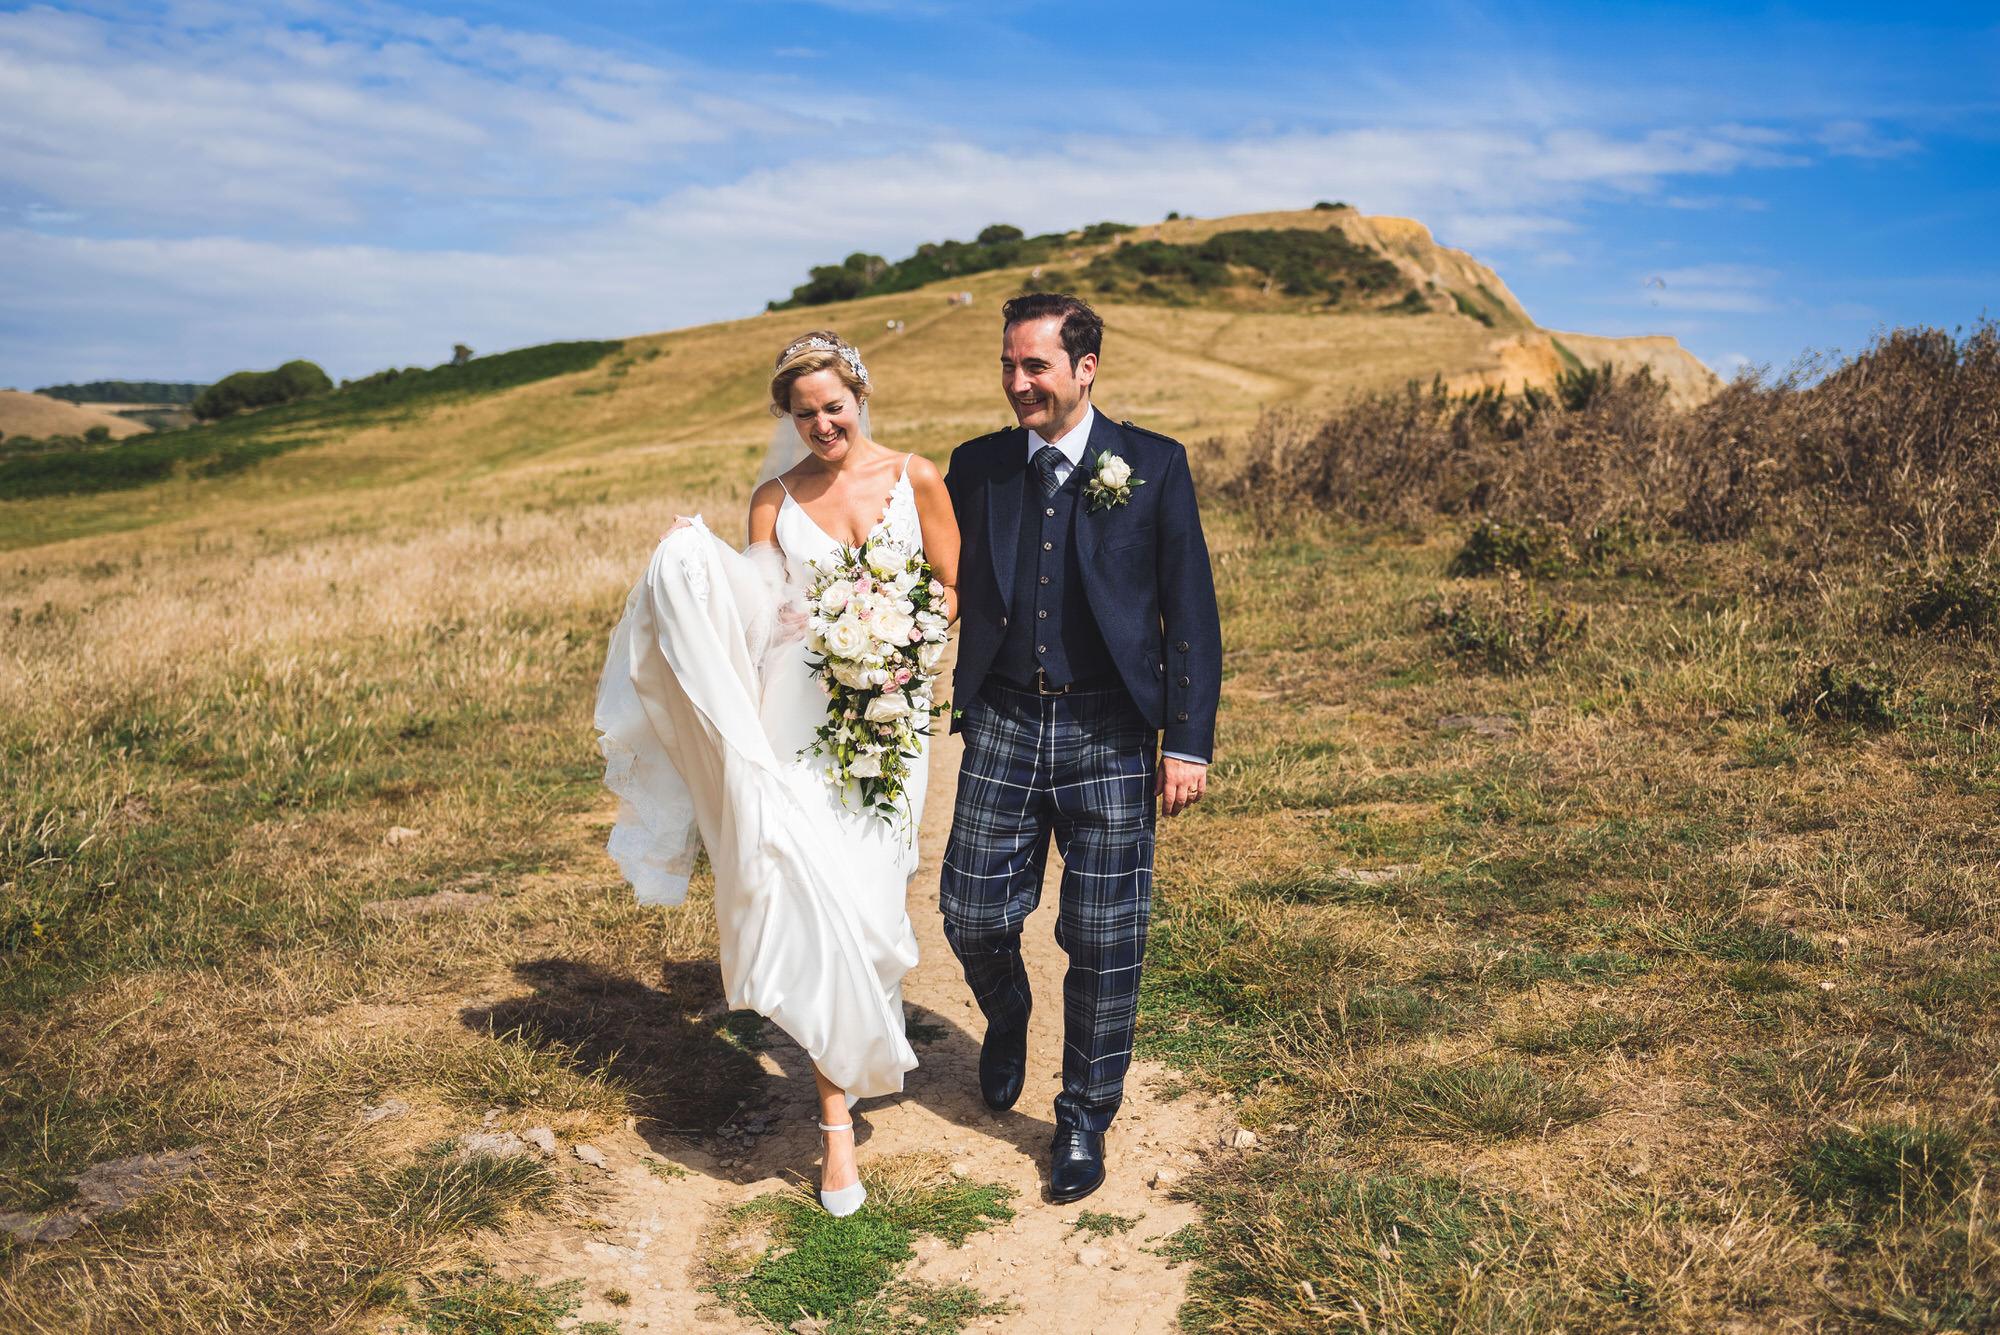 Dorset marquee wedding by the sea simon biffen photography 32